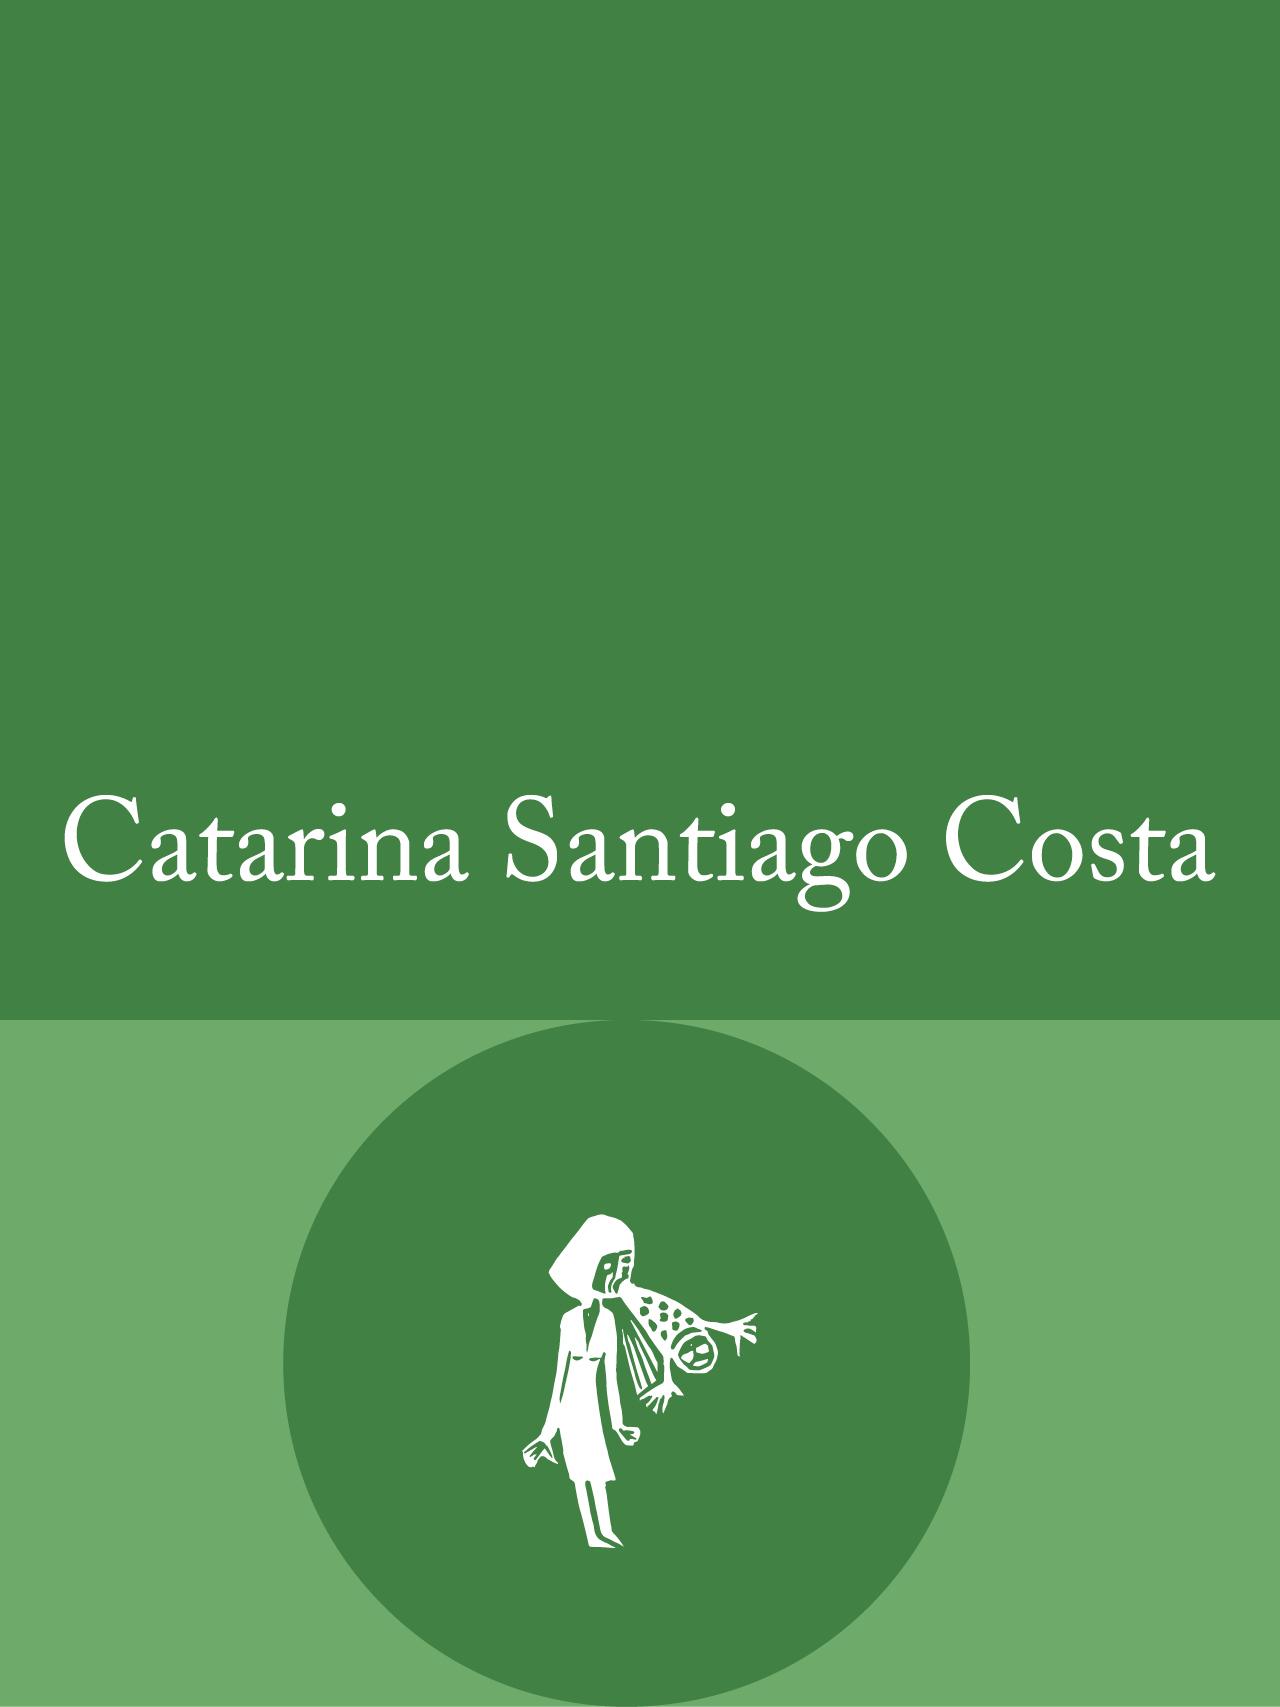 CatarinaSCosta.jpg